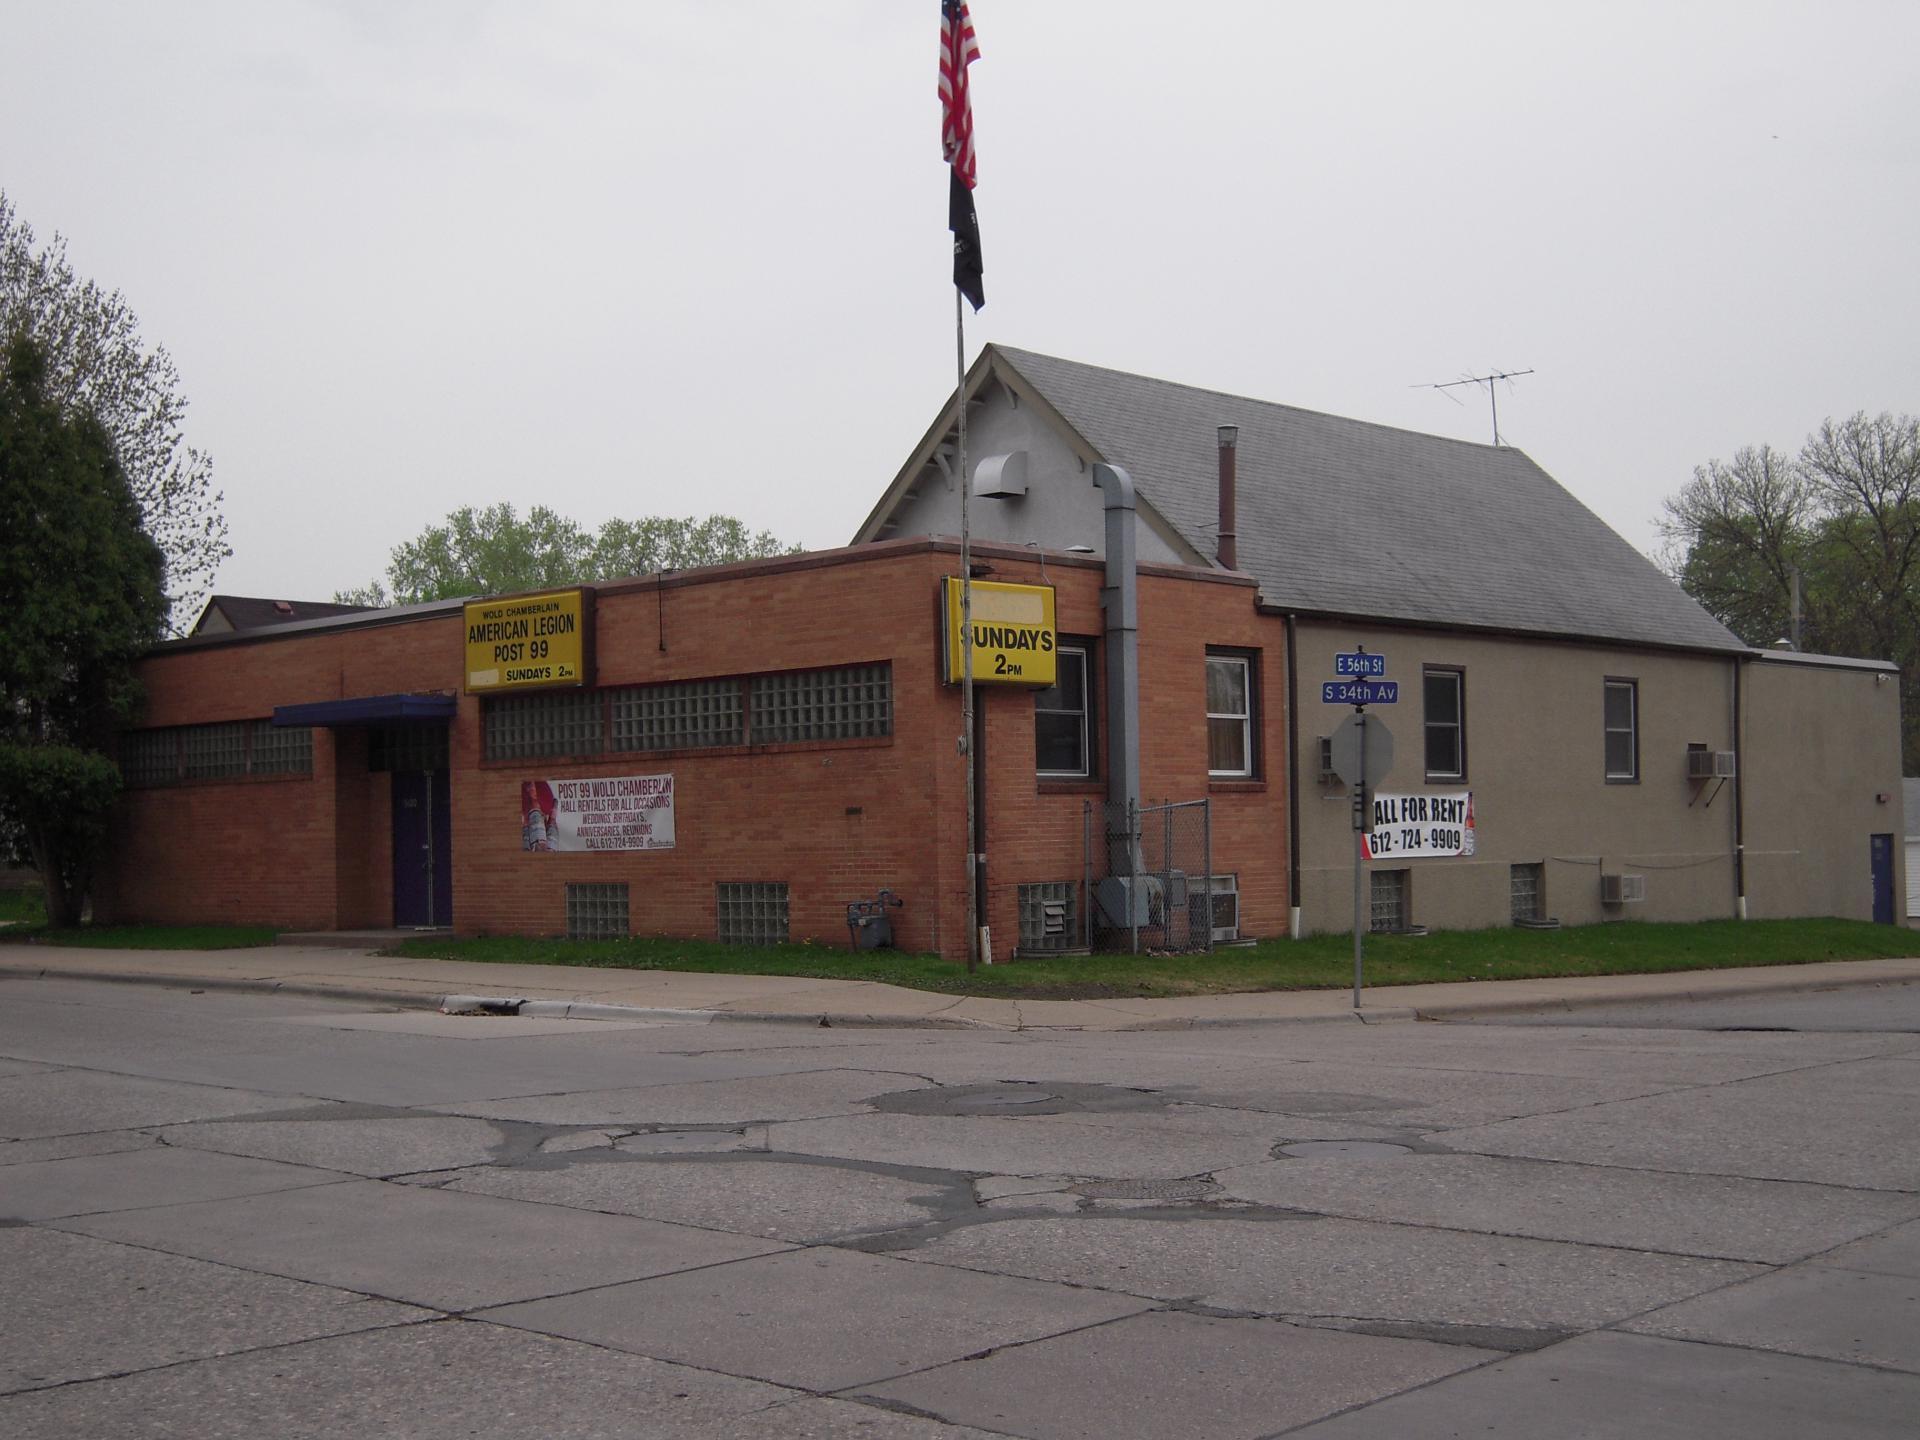 Post 99 Minneapolis, Minnesota